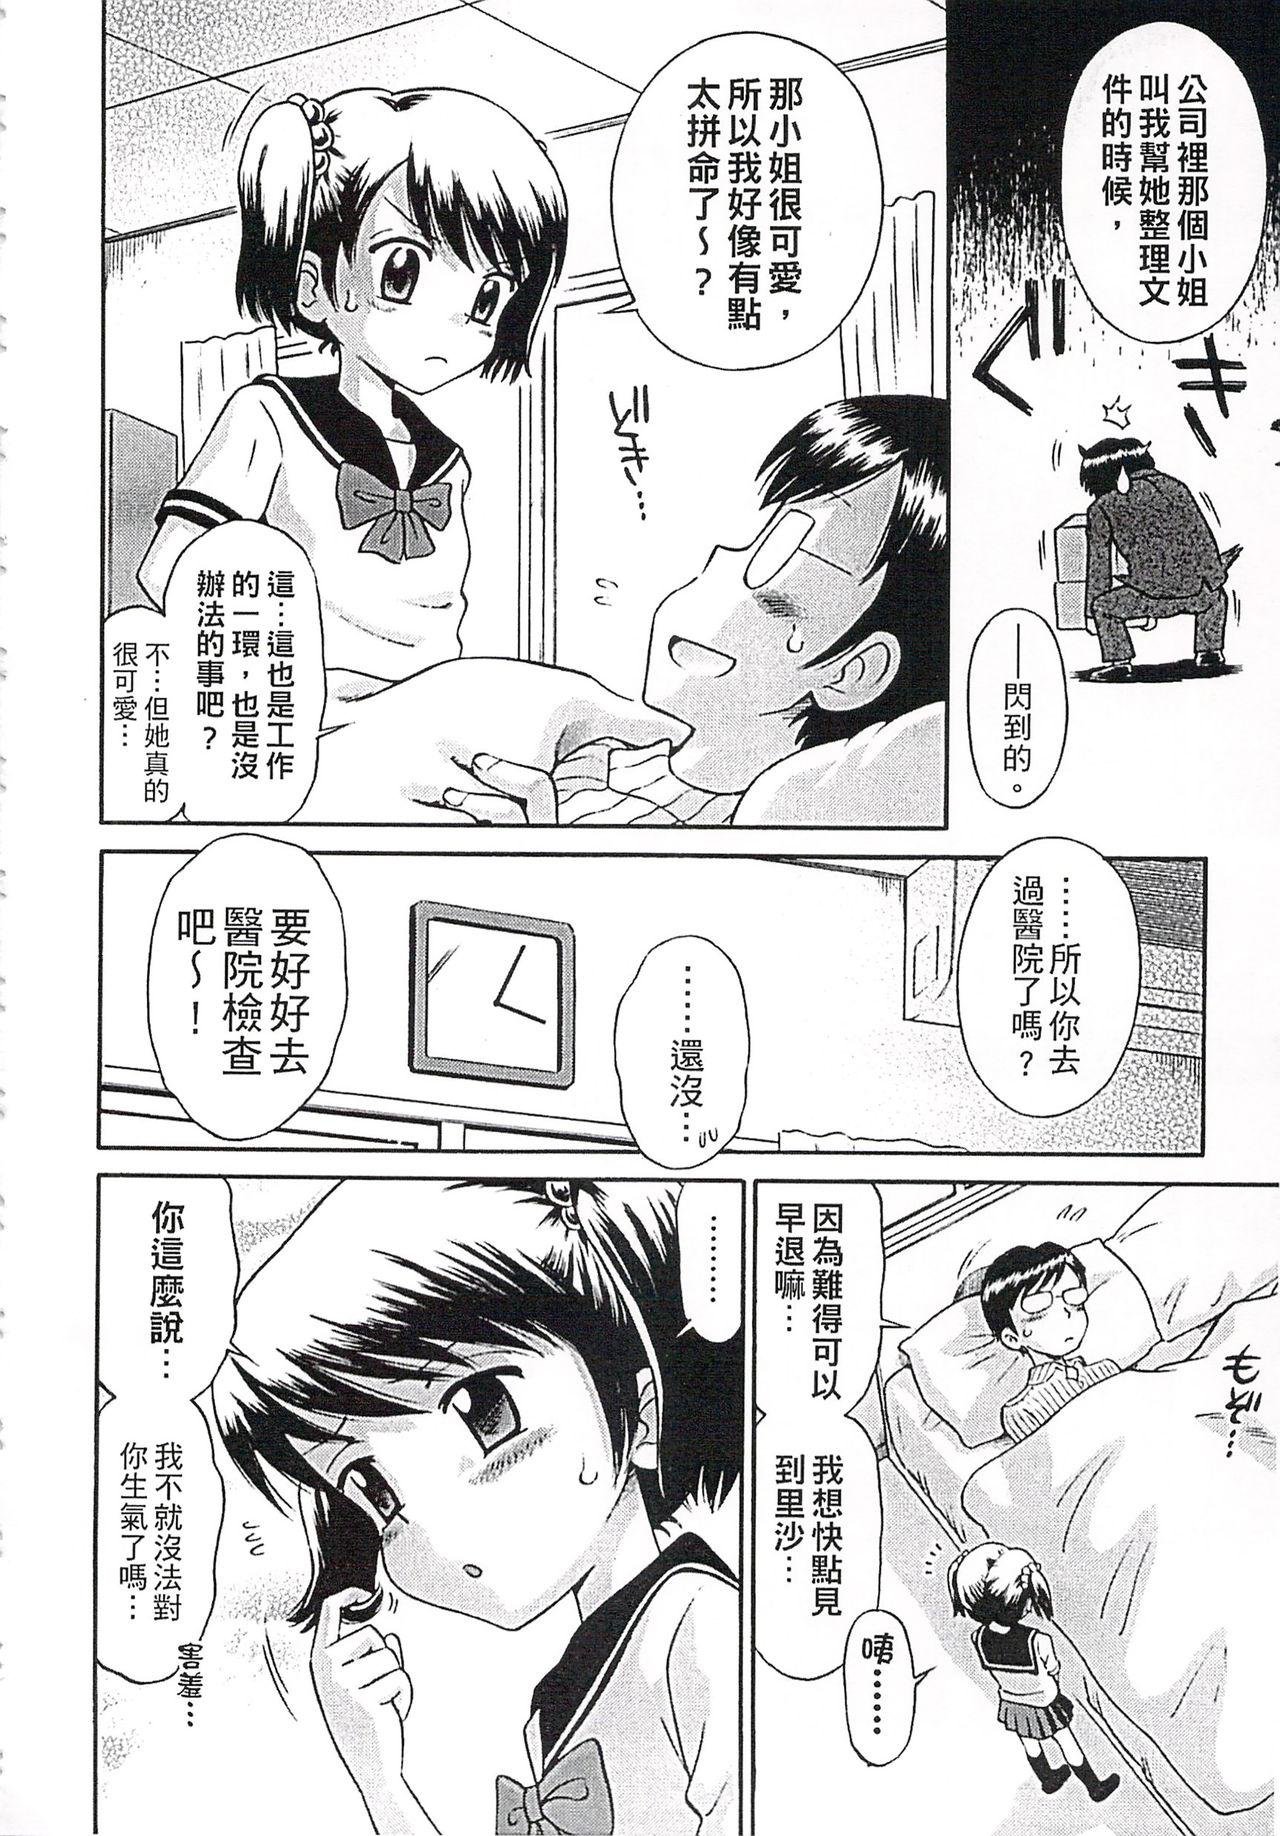 Kore demo Otona Desu Kedo!? Mrs.LOLITA Kanzenban   人家是大人啦! ~Mrs.LOLITA完全版 45